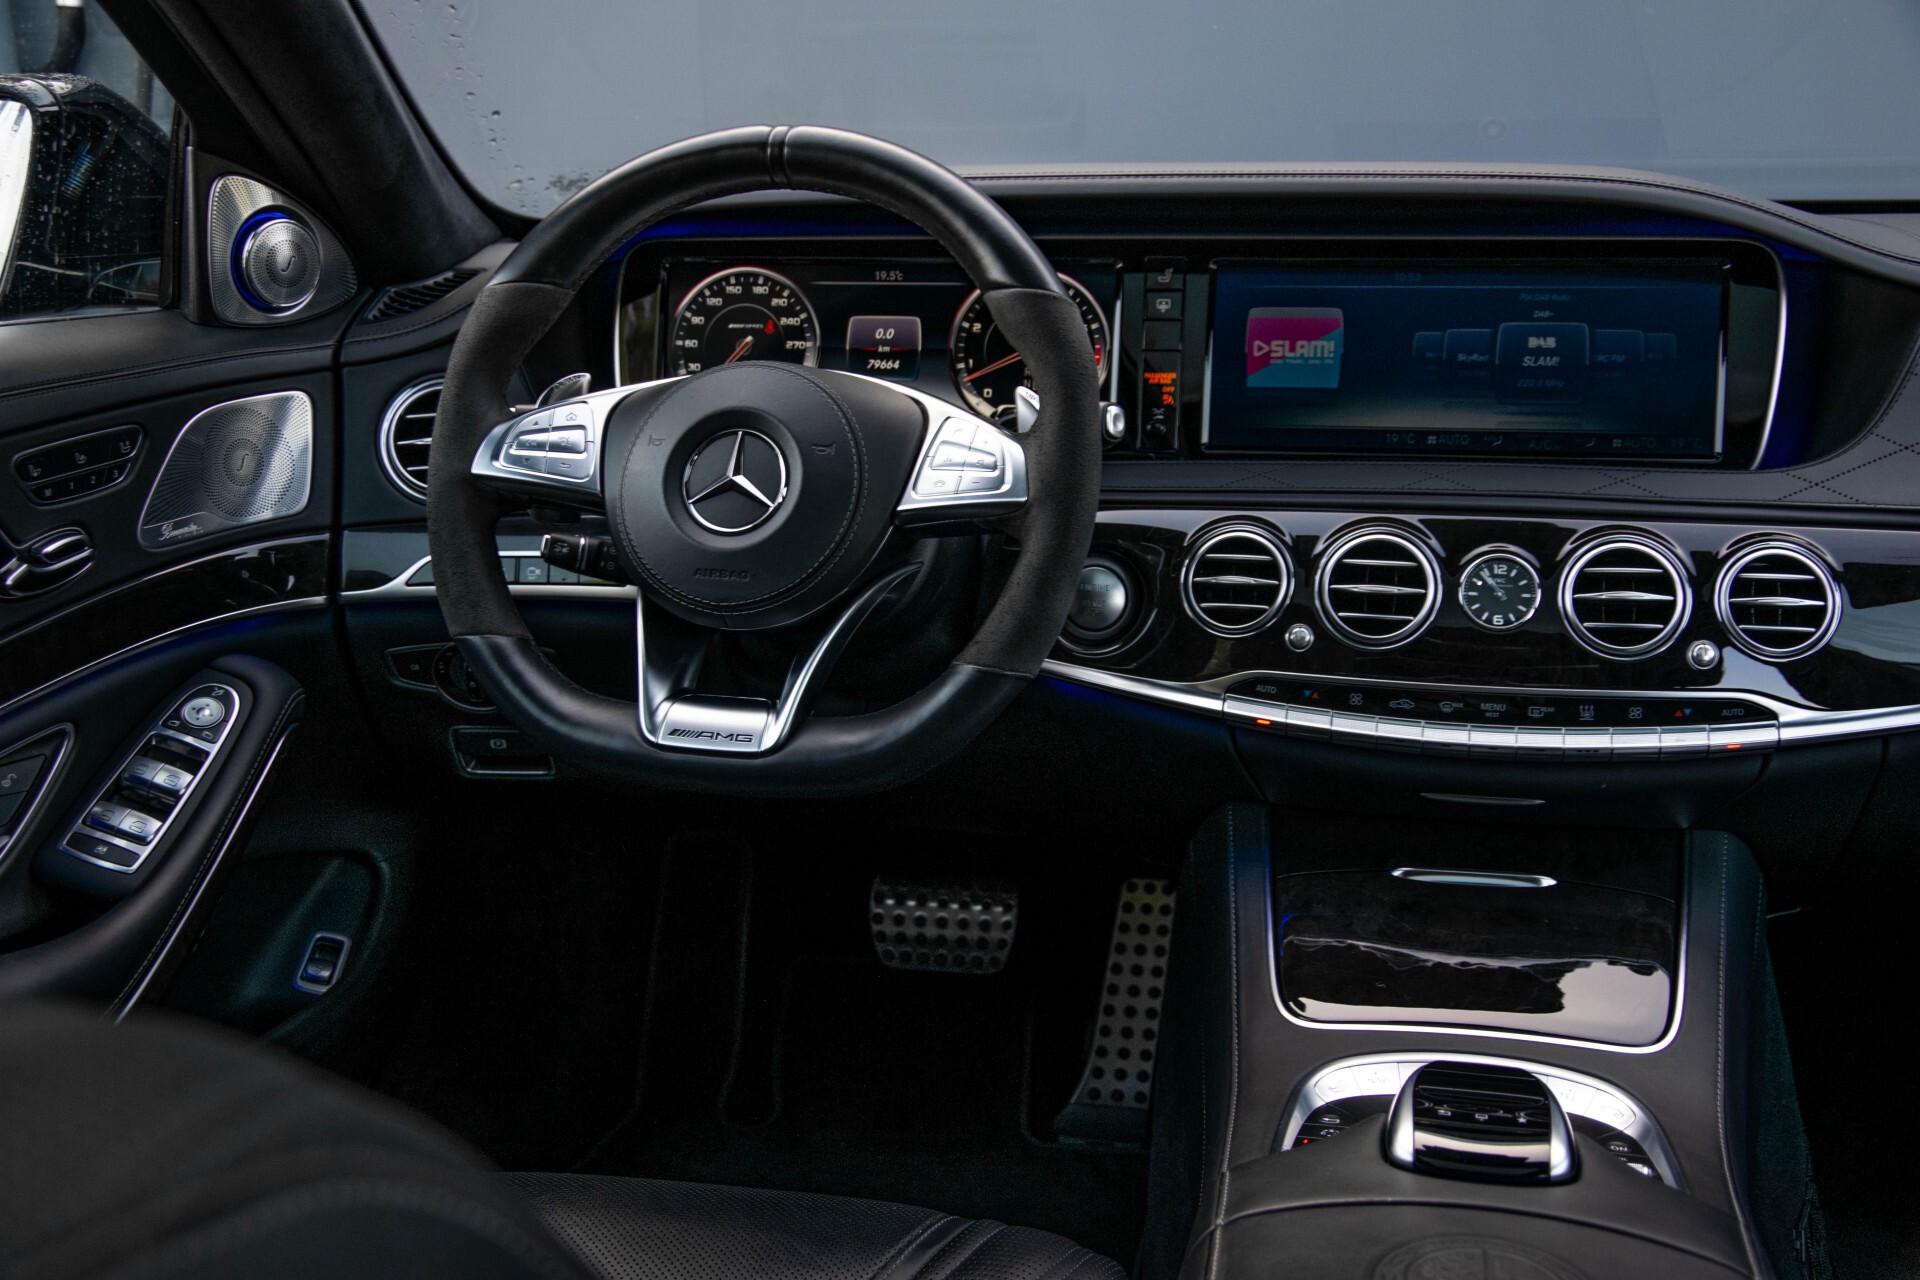 Mercedes-Benz S-Klasse 63 AMG Exclusive/Burmester High-End/Driverspack Aut7 Foto 6